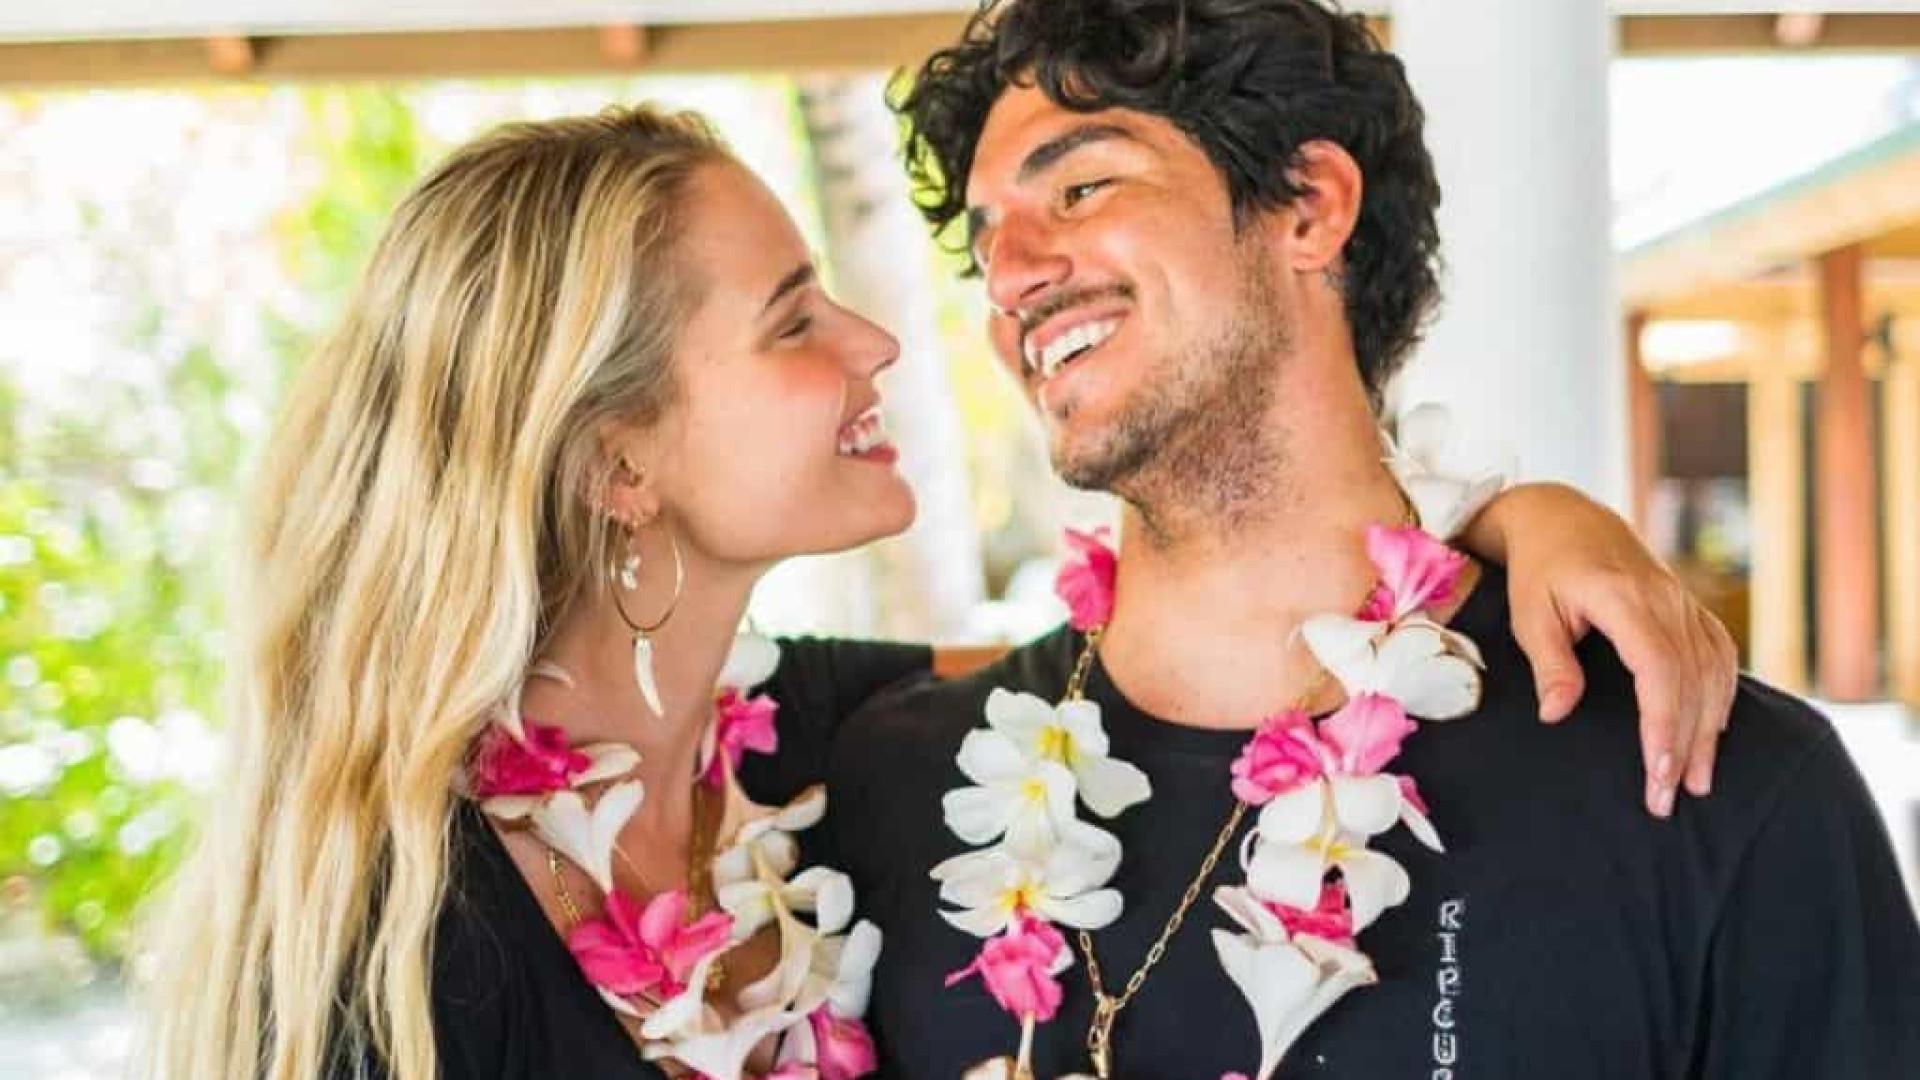 Yasmin Brunet e Gabriel Medina se casam no Havaí, diz colunista